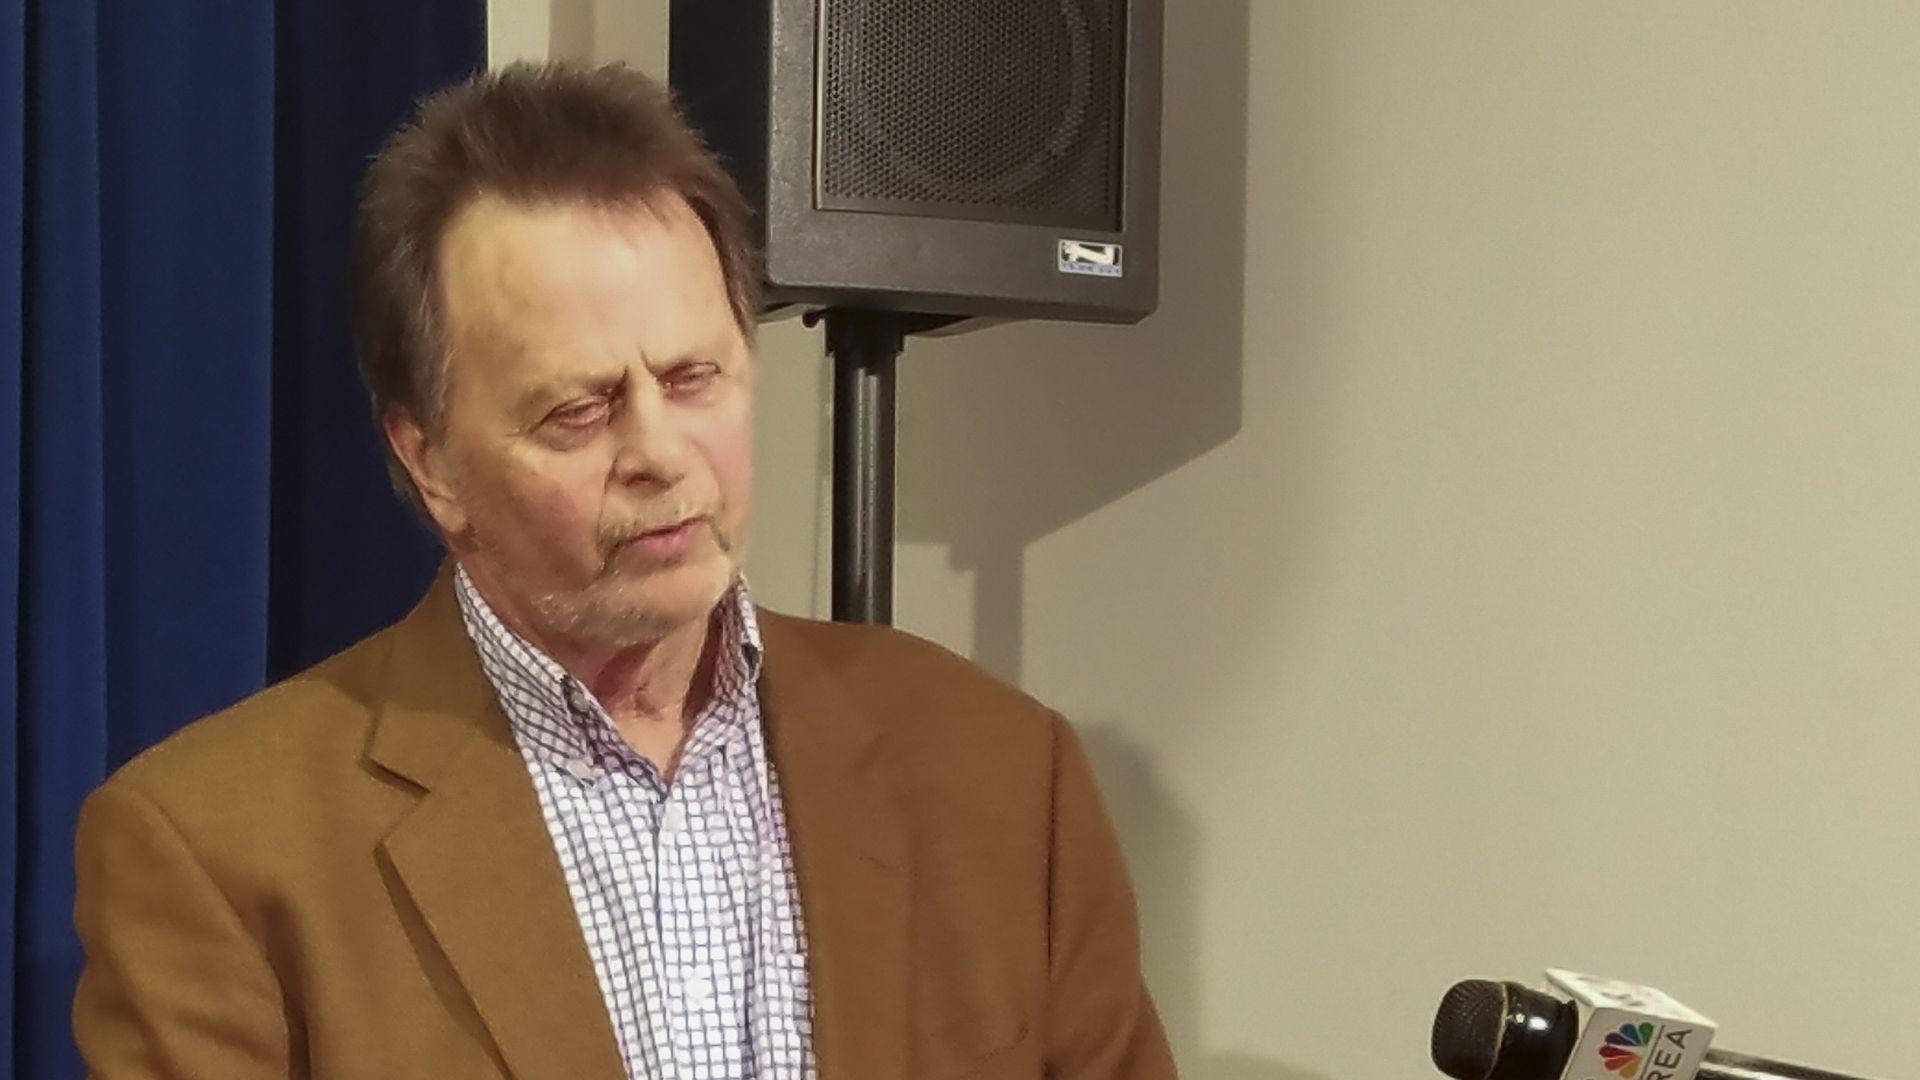 Edwin Hardeman, who sued Bayer.